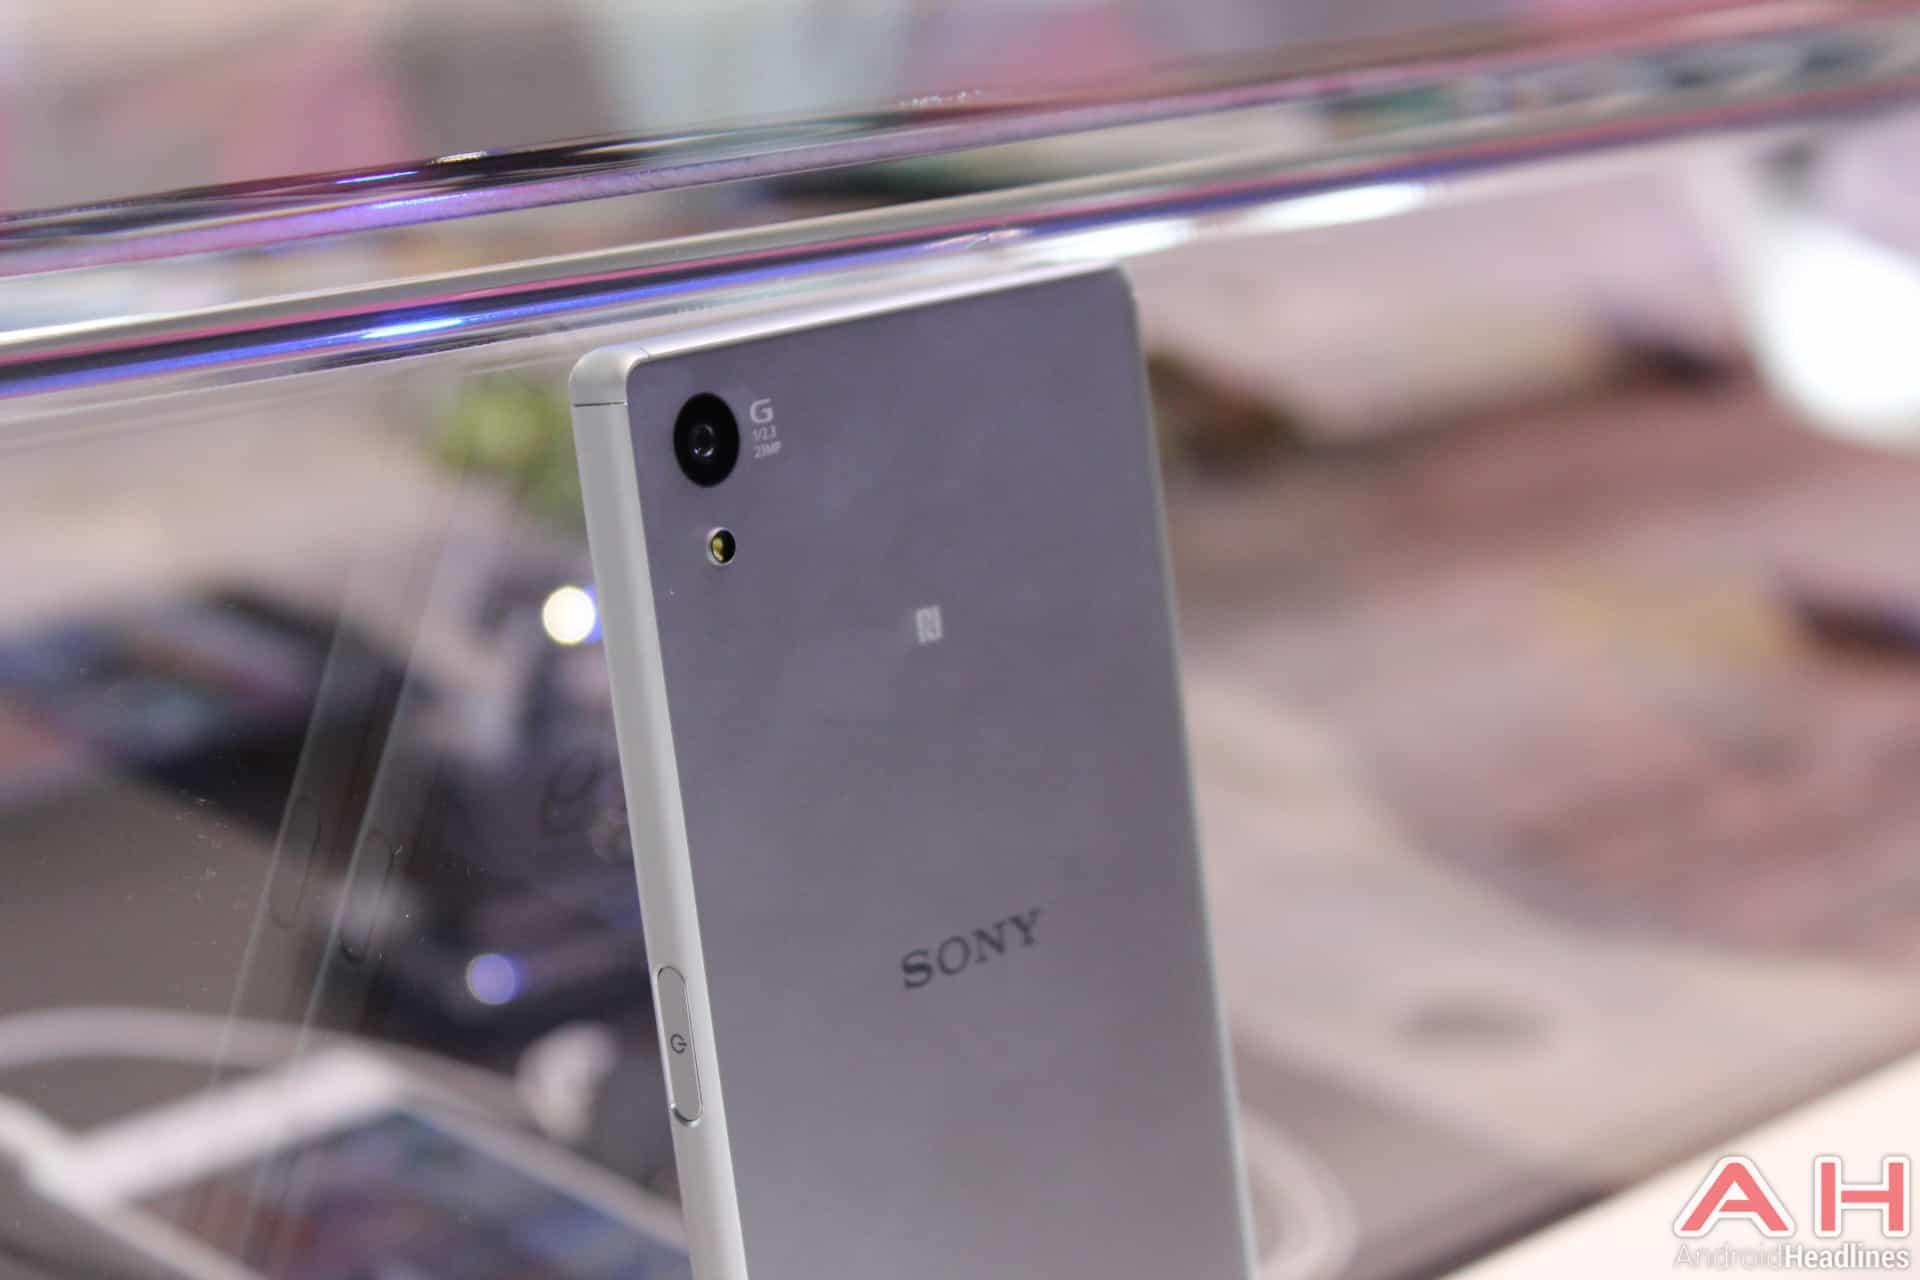 Sony Xperia Z5 IFA AH 11